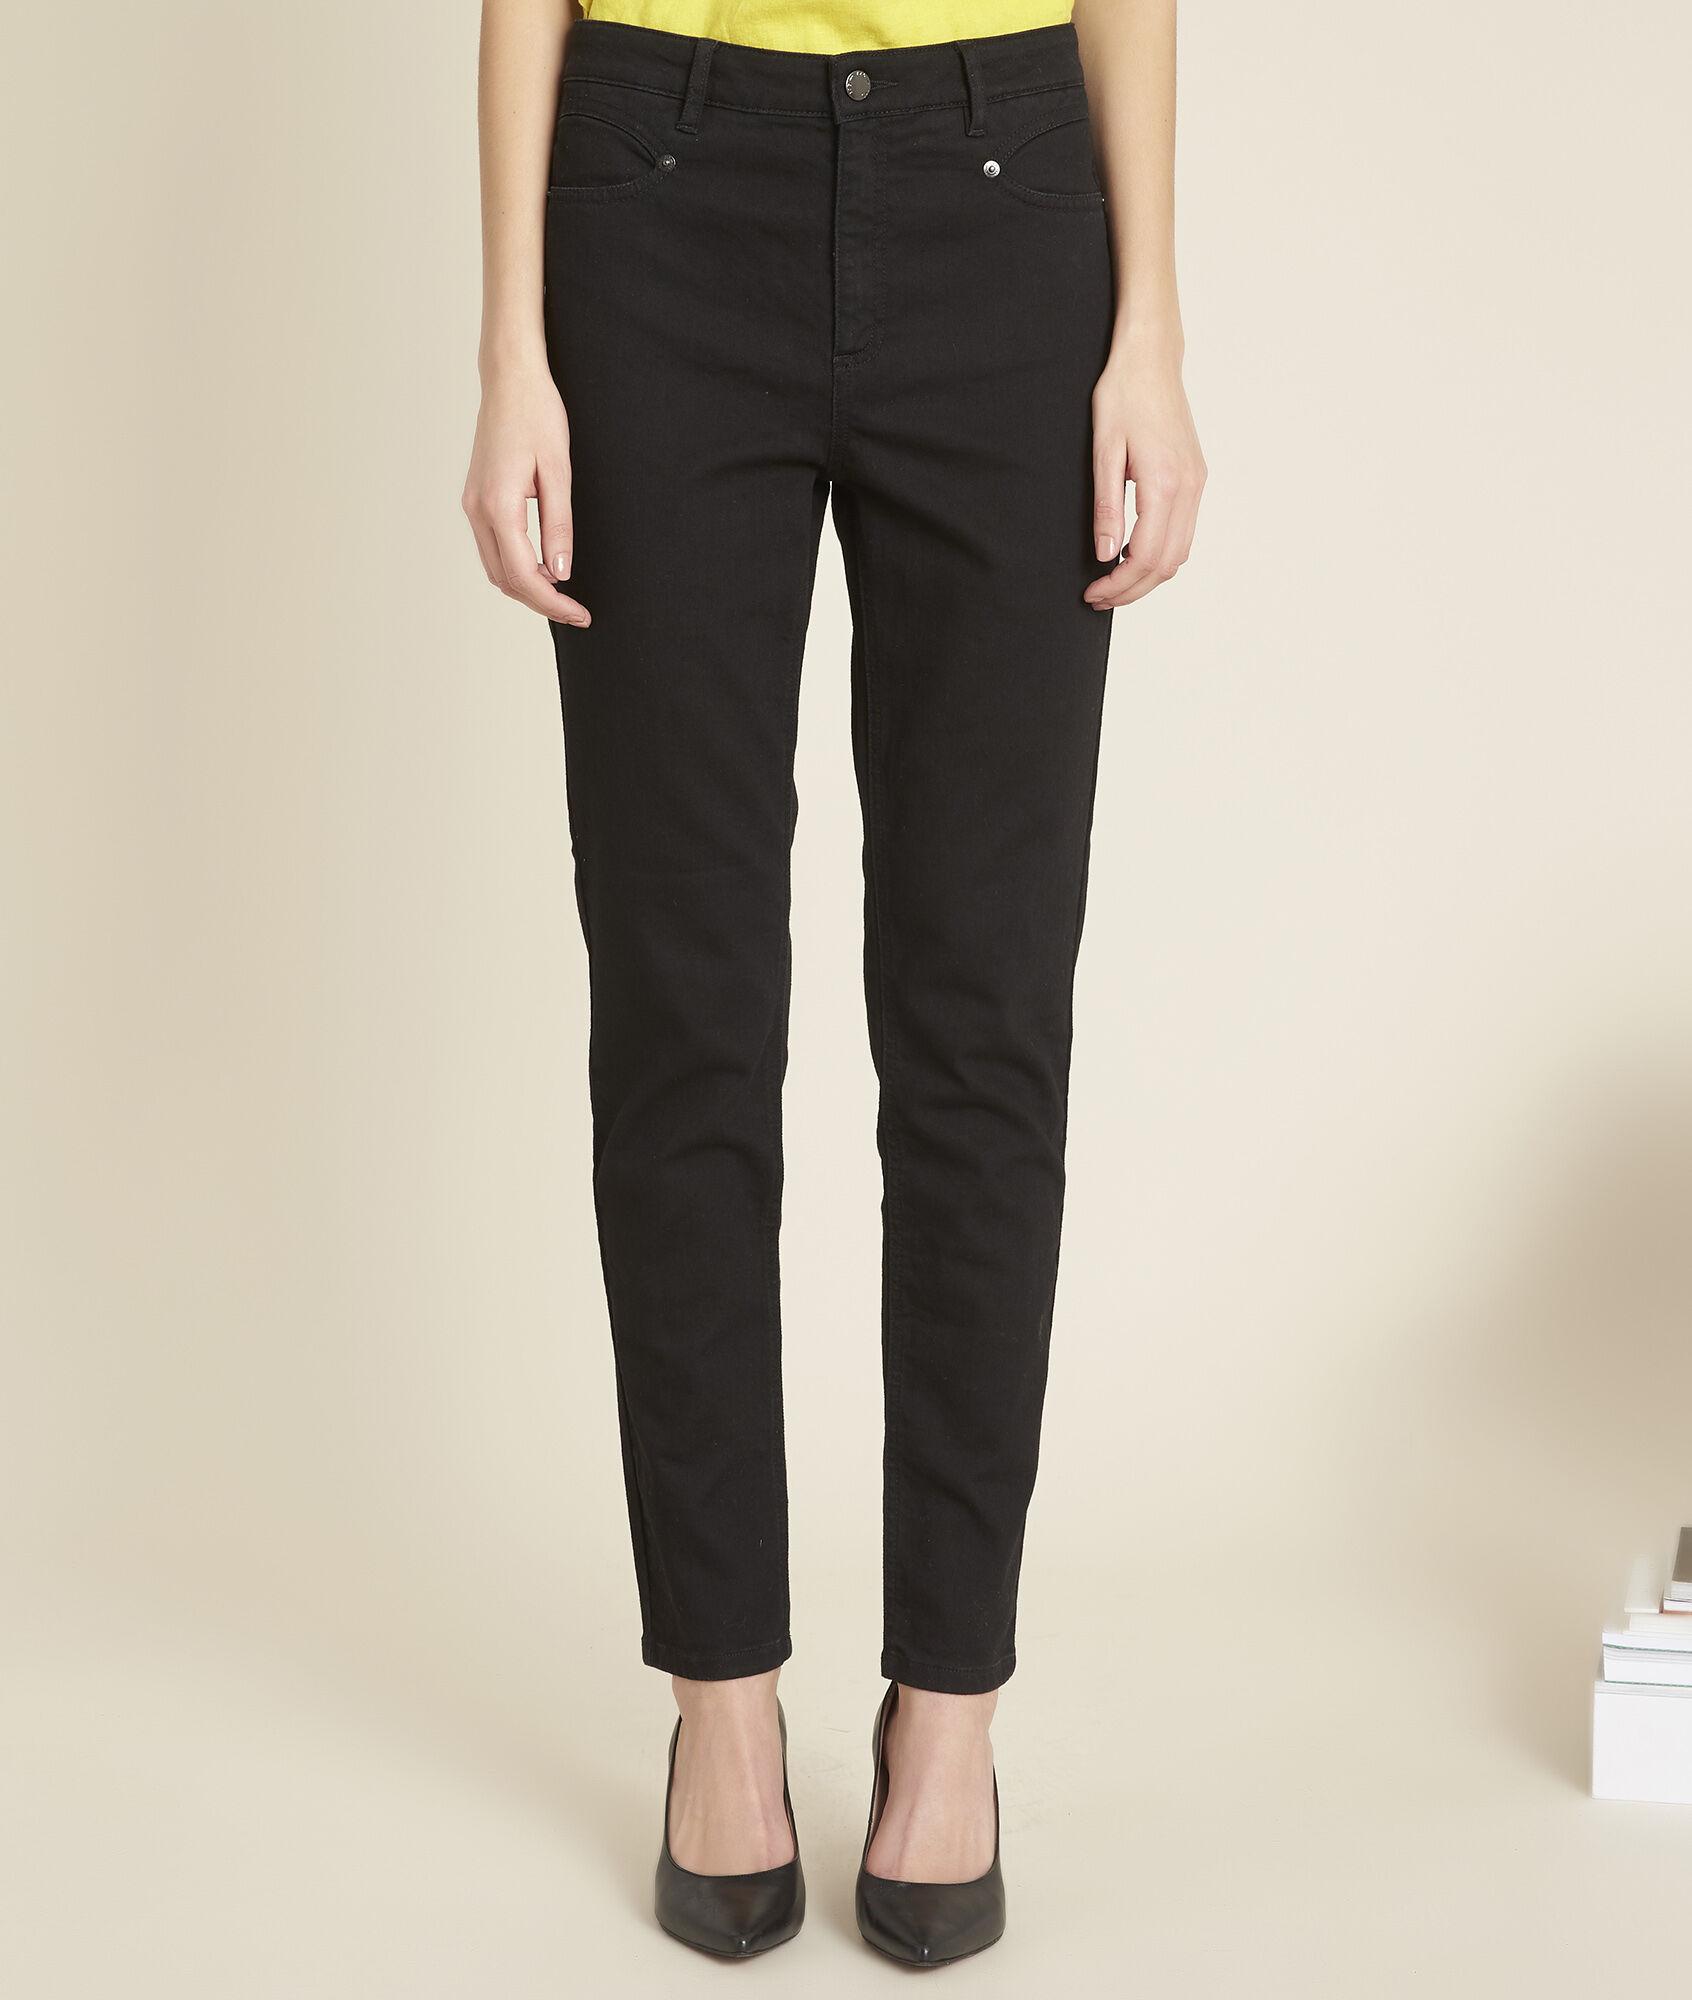 Schwarze formende 78 Slim Fit Jeans Honore